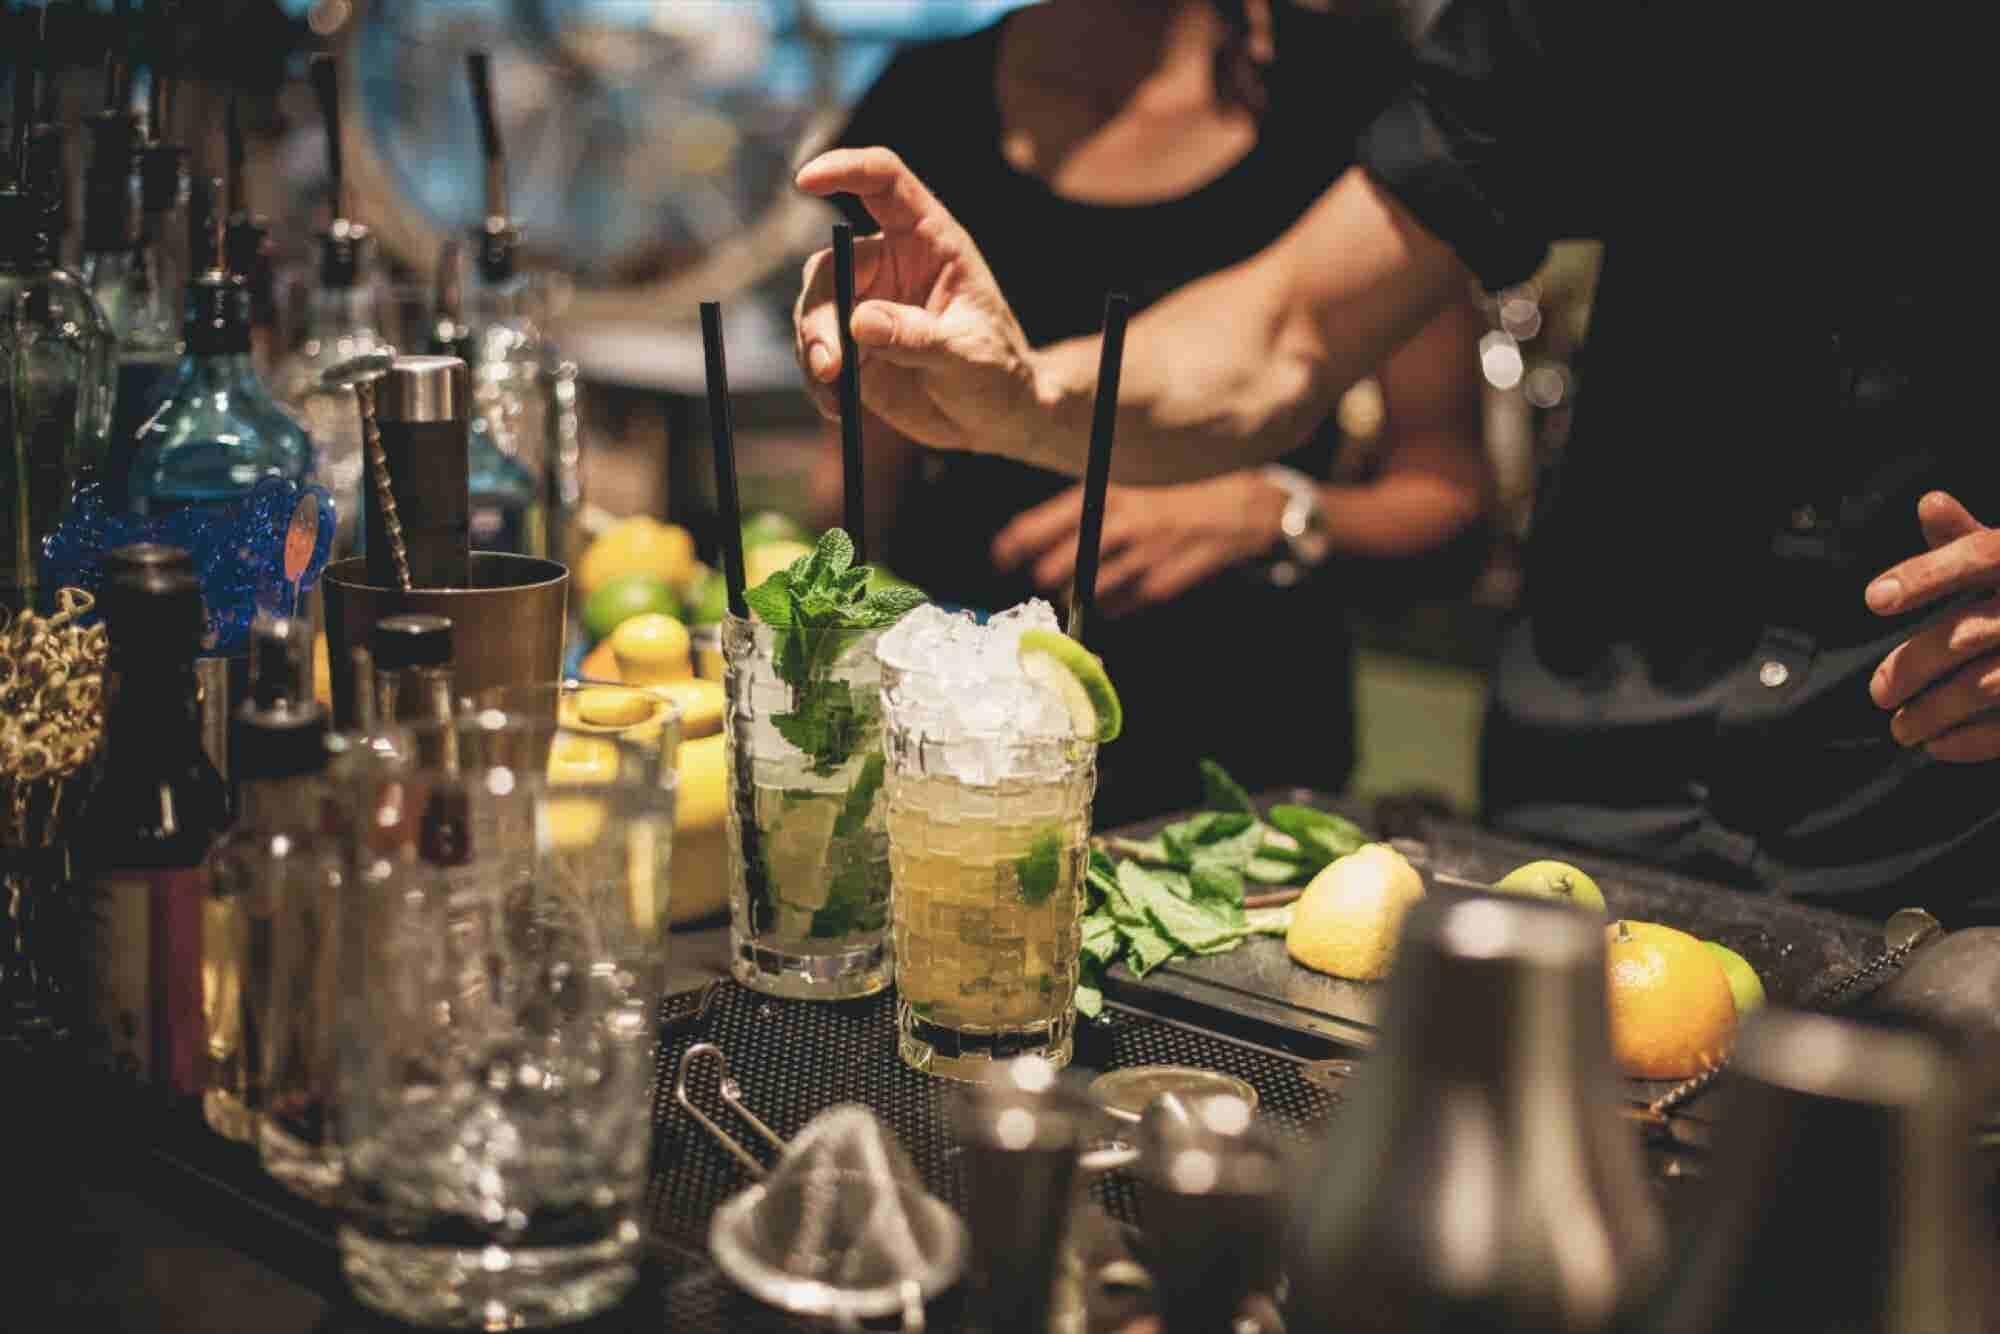 Bartender-Approved Tips for Negotiating Deals at the Bar